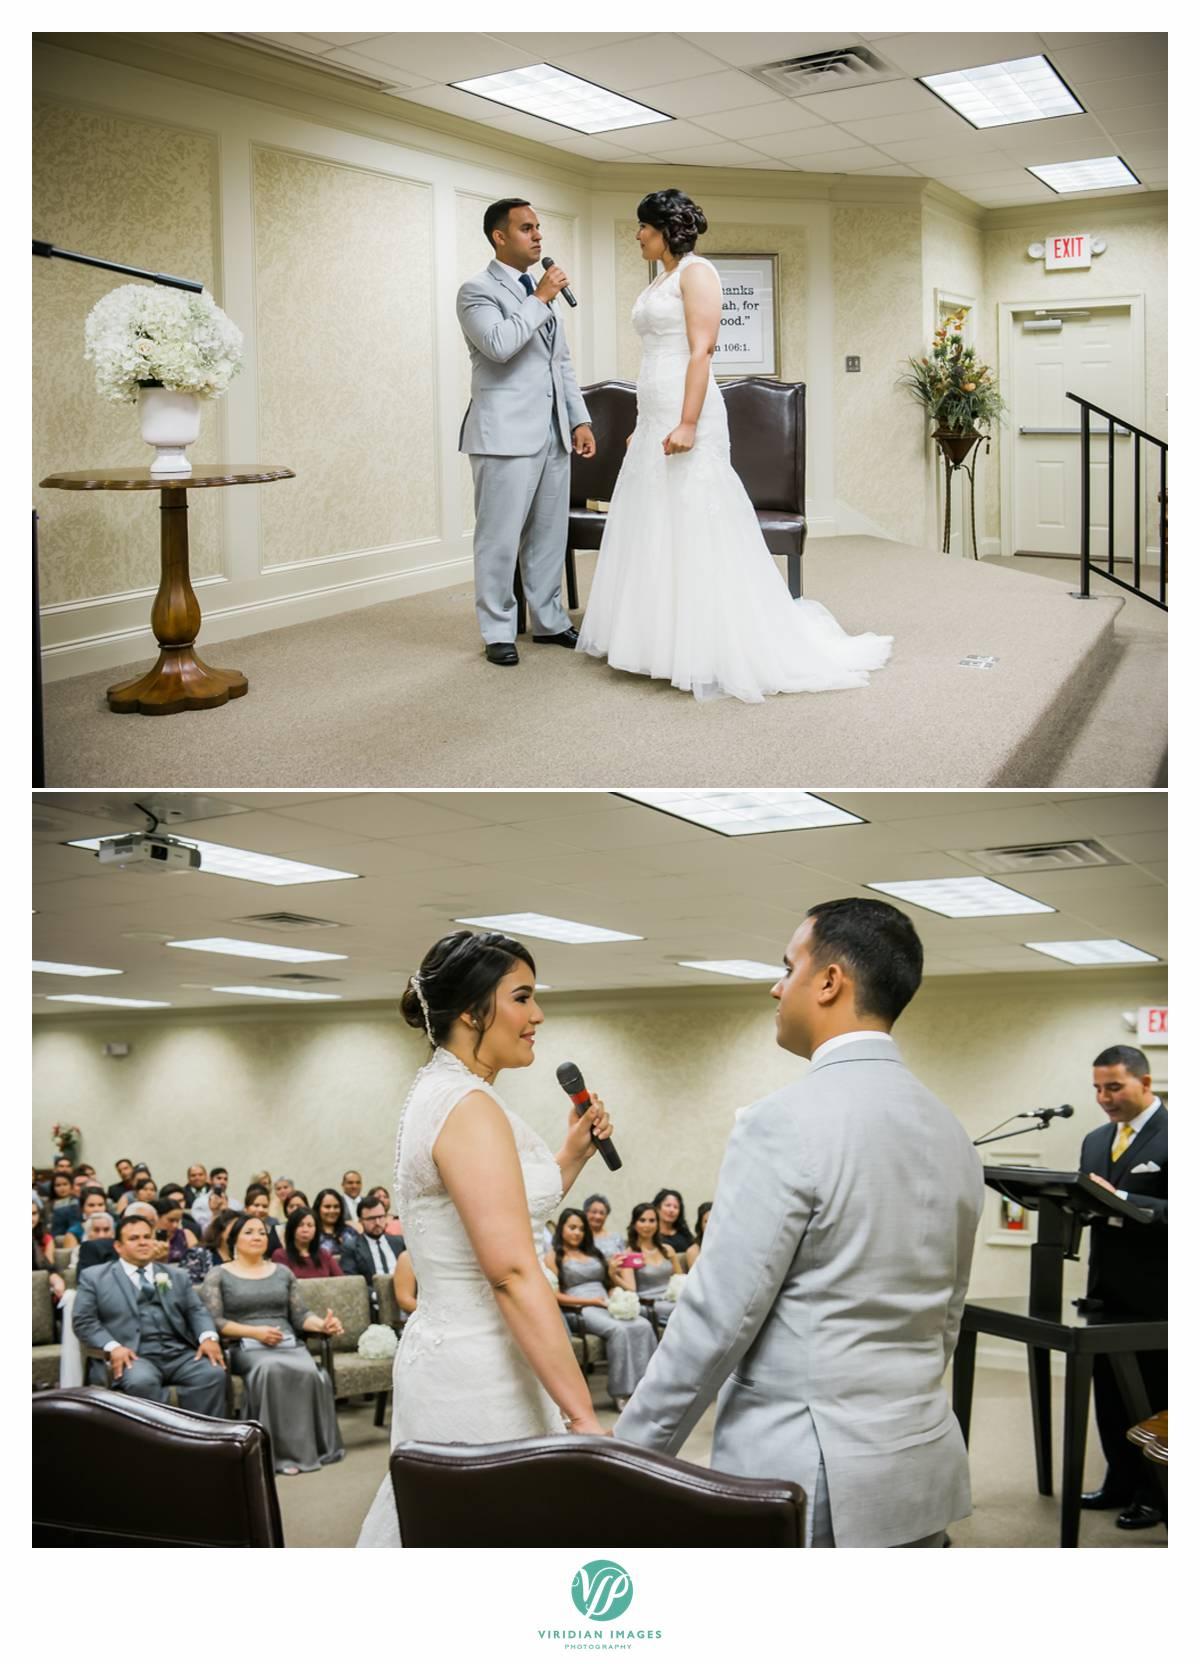 Hilton-Head-Callawassie-Club-Wedding-Viridian-Images-Photography-photo 17